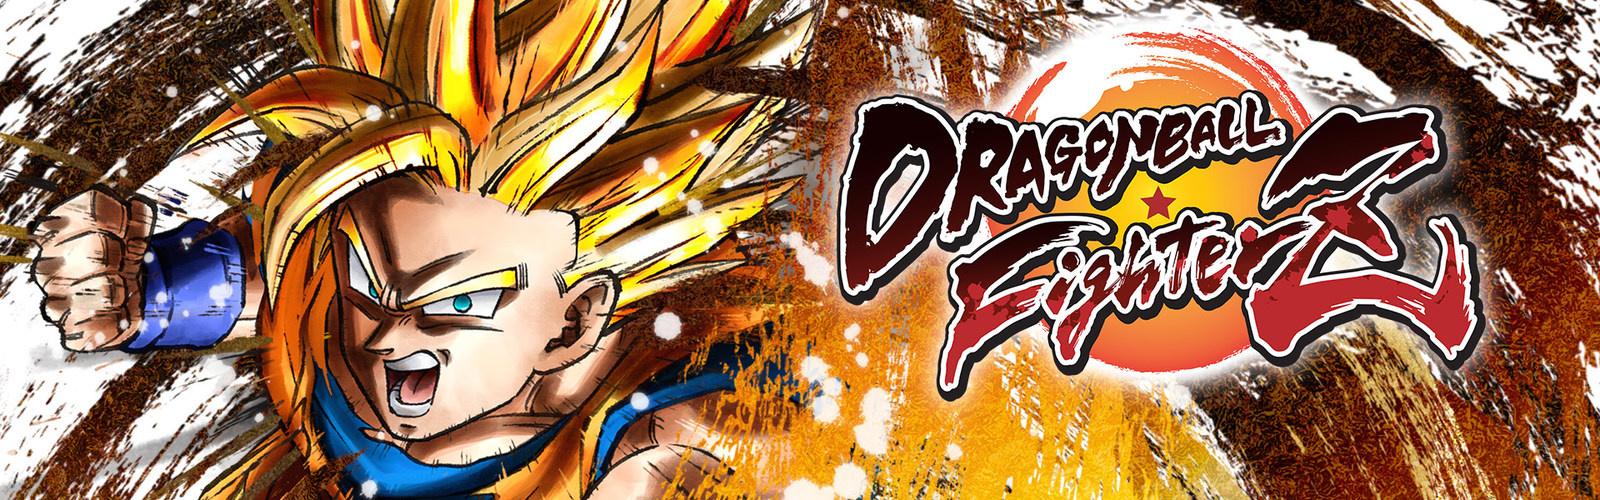 Rétrospective 2018 Dragon Ball FighterZ